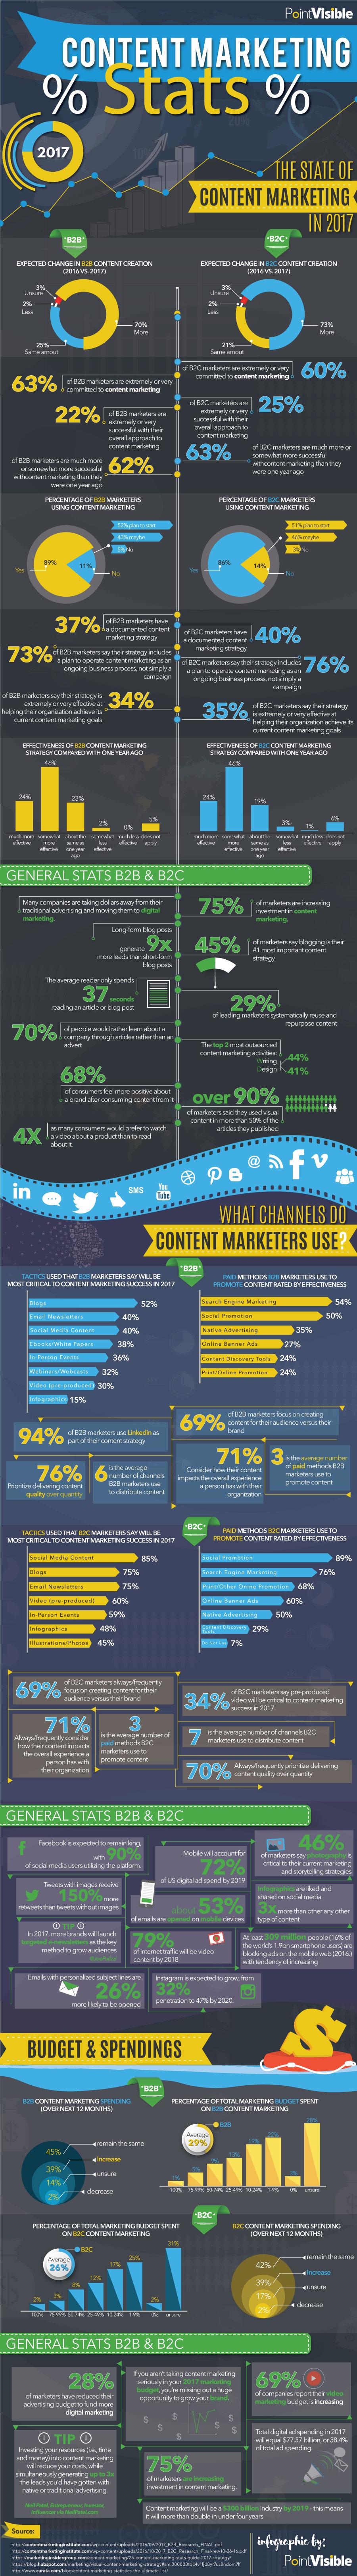 Content marketing statistics 2017